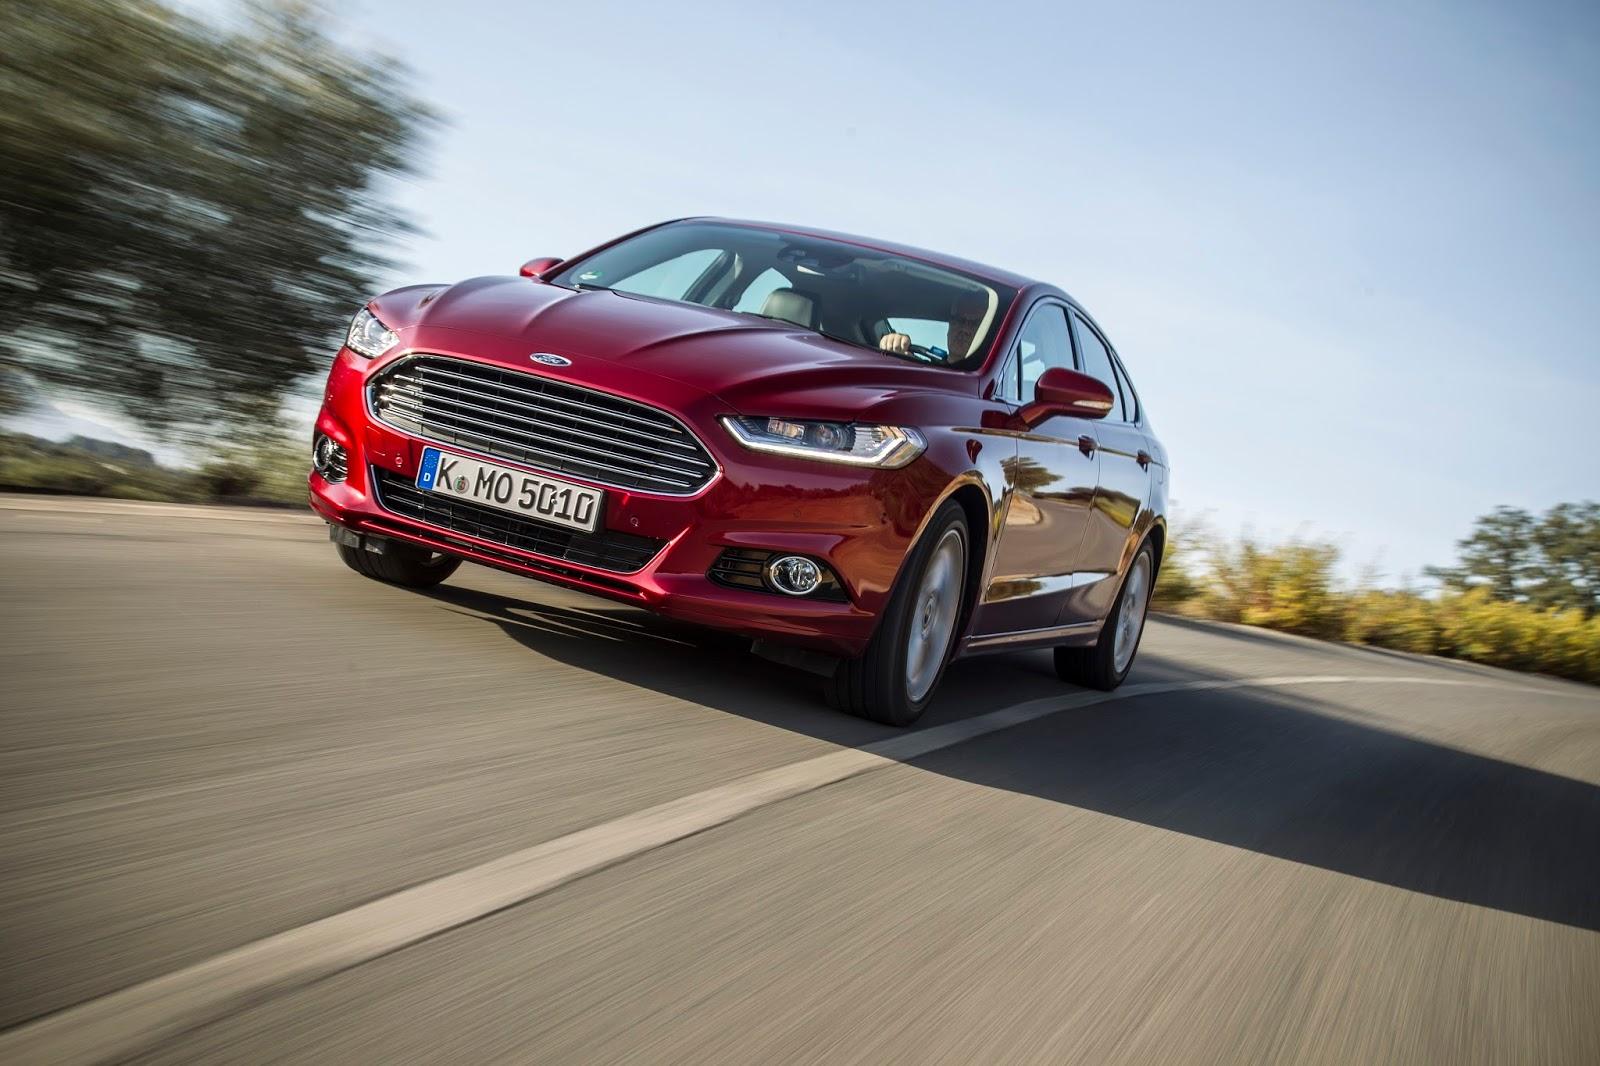 High%2BRes FordMondeo 5Door 09 Η Ford αύξησε 20% τις Ευρωπαϊκές πωλήσεις της και έχει ήδη 12.000 παραγγελίες της νέας Mustang Ford, Ford Mustang, Ford Ranger, Ford Transit, Sales, πωλήσεις